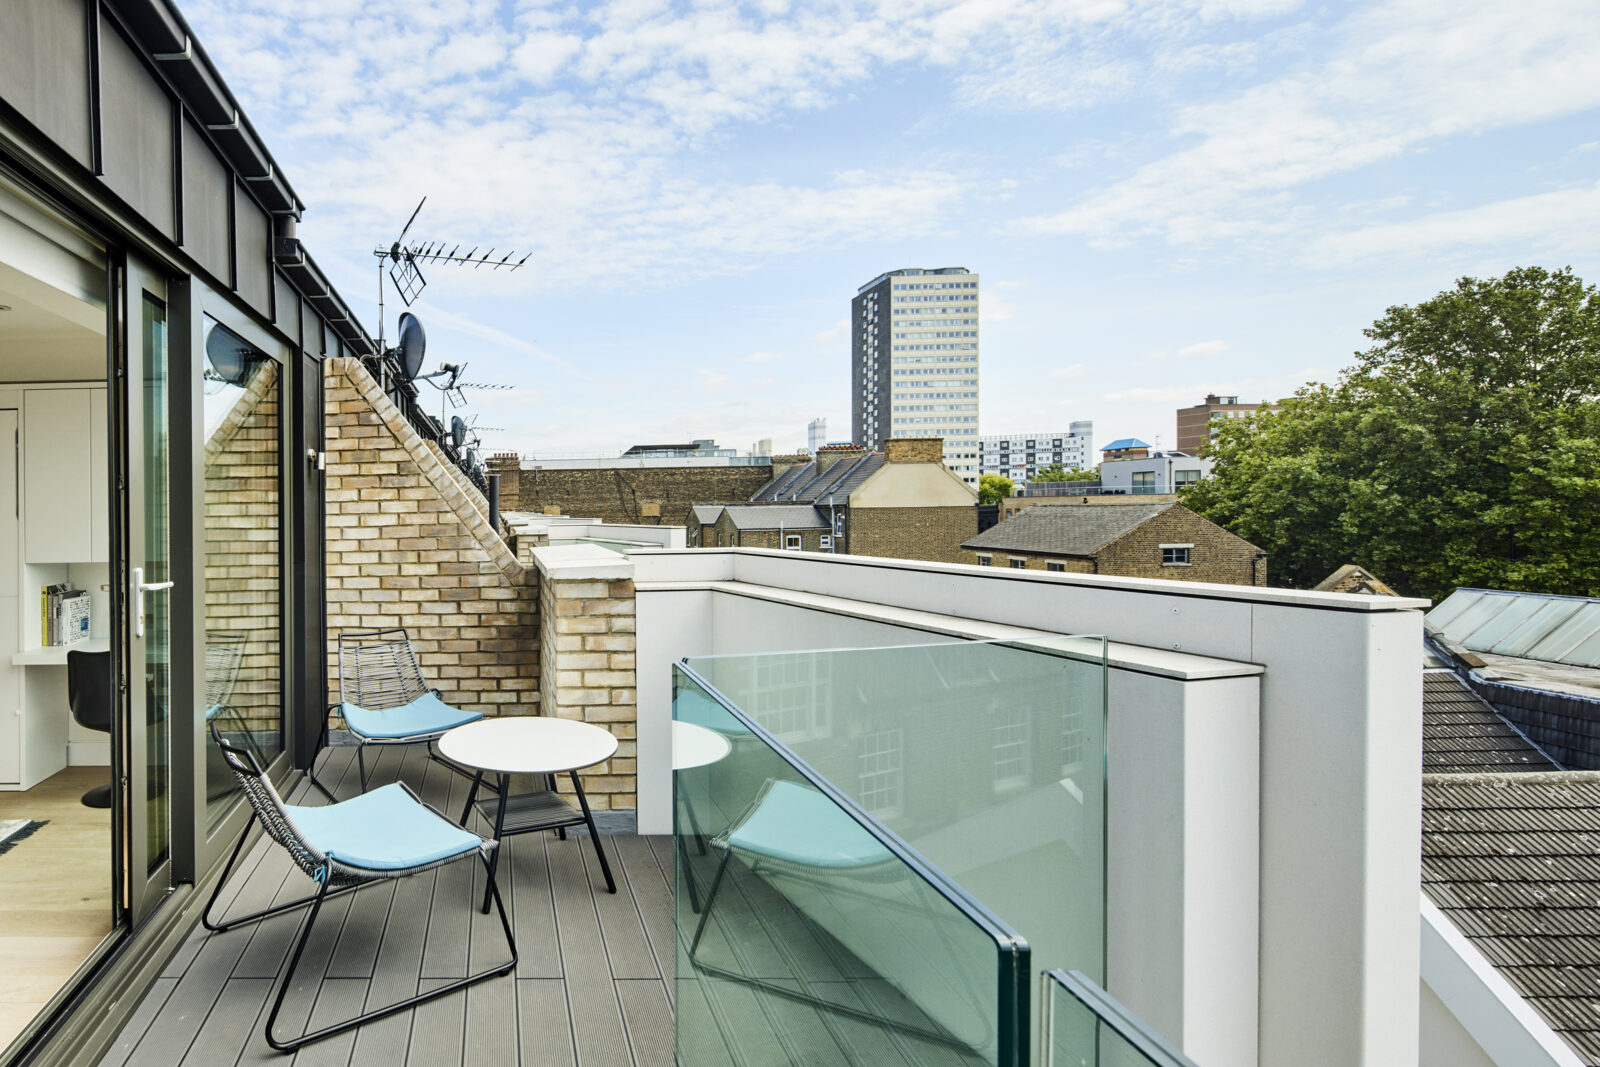 Warriner Gardens in Battersea rethink the Victorian terrace